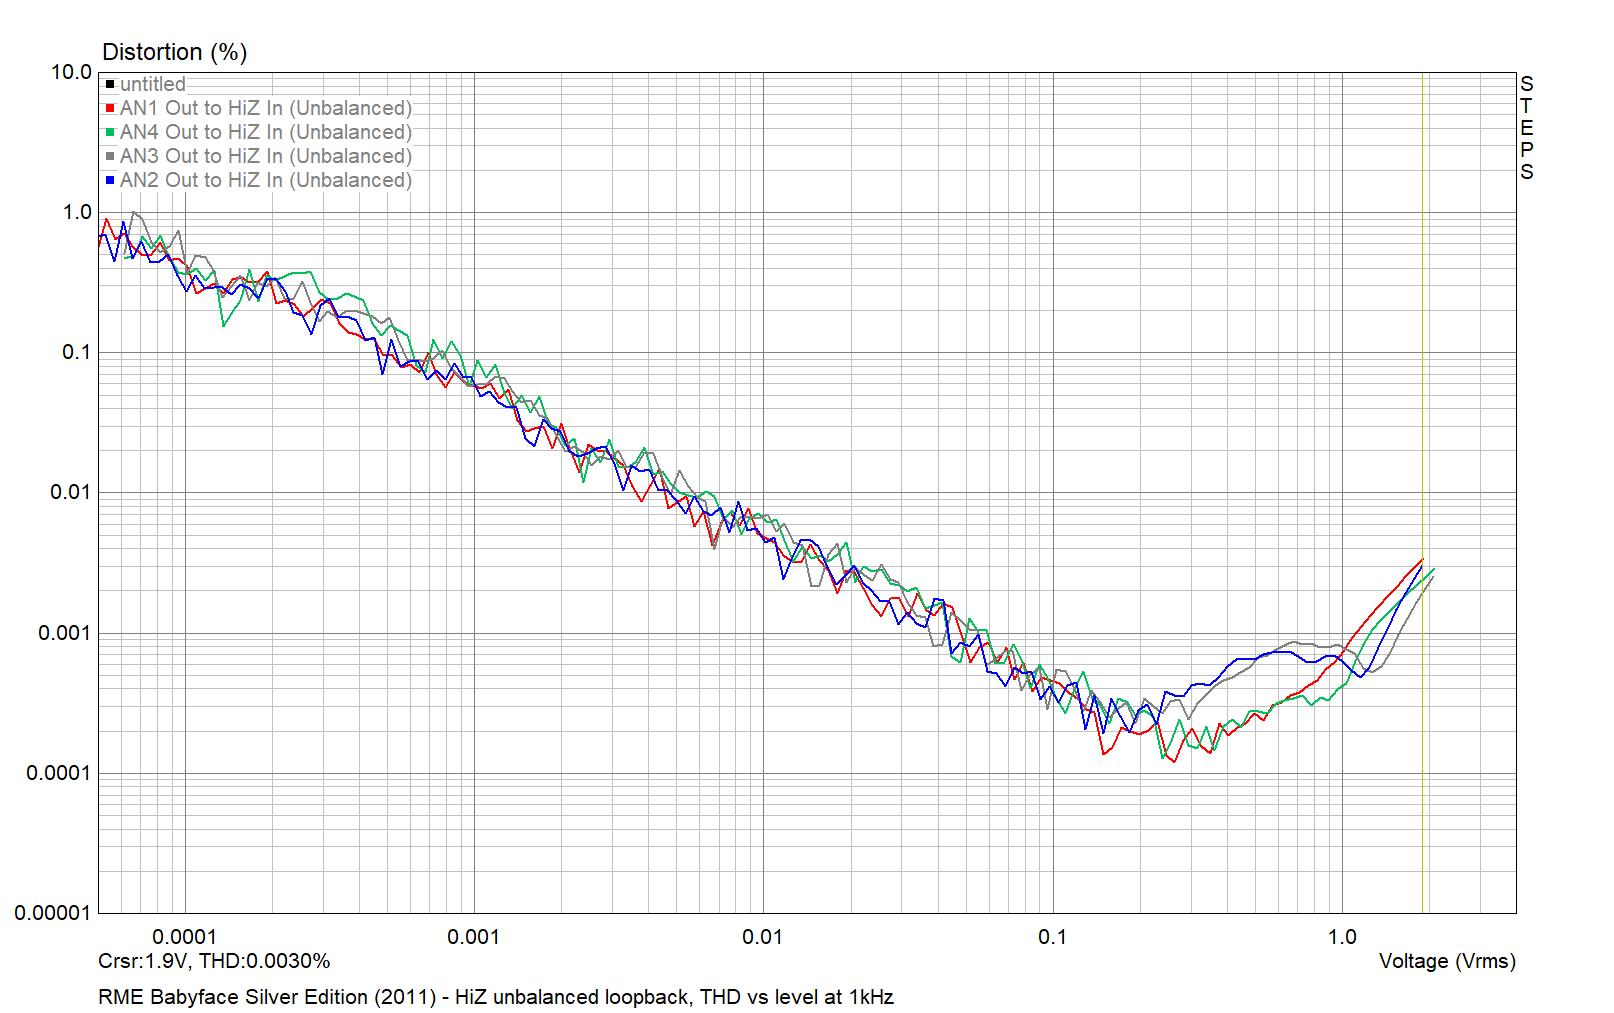 RME Babyface Silver Edition 2011 - HiZ unbalanced THD vs level 2021-04-01.png